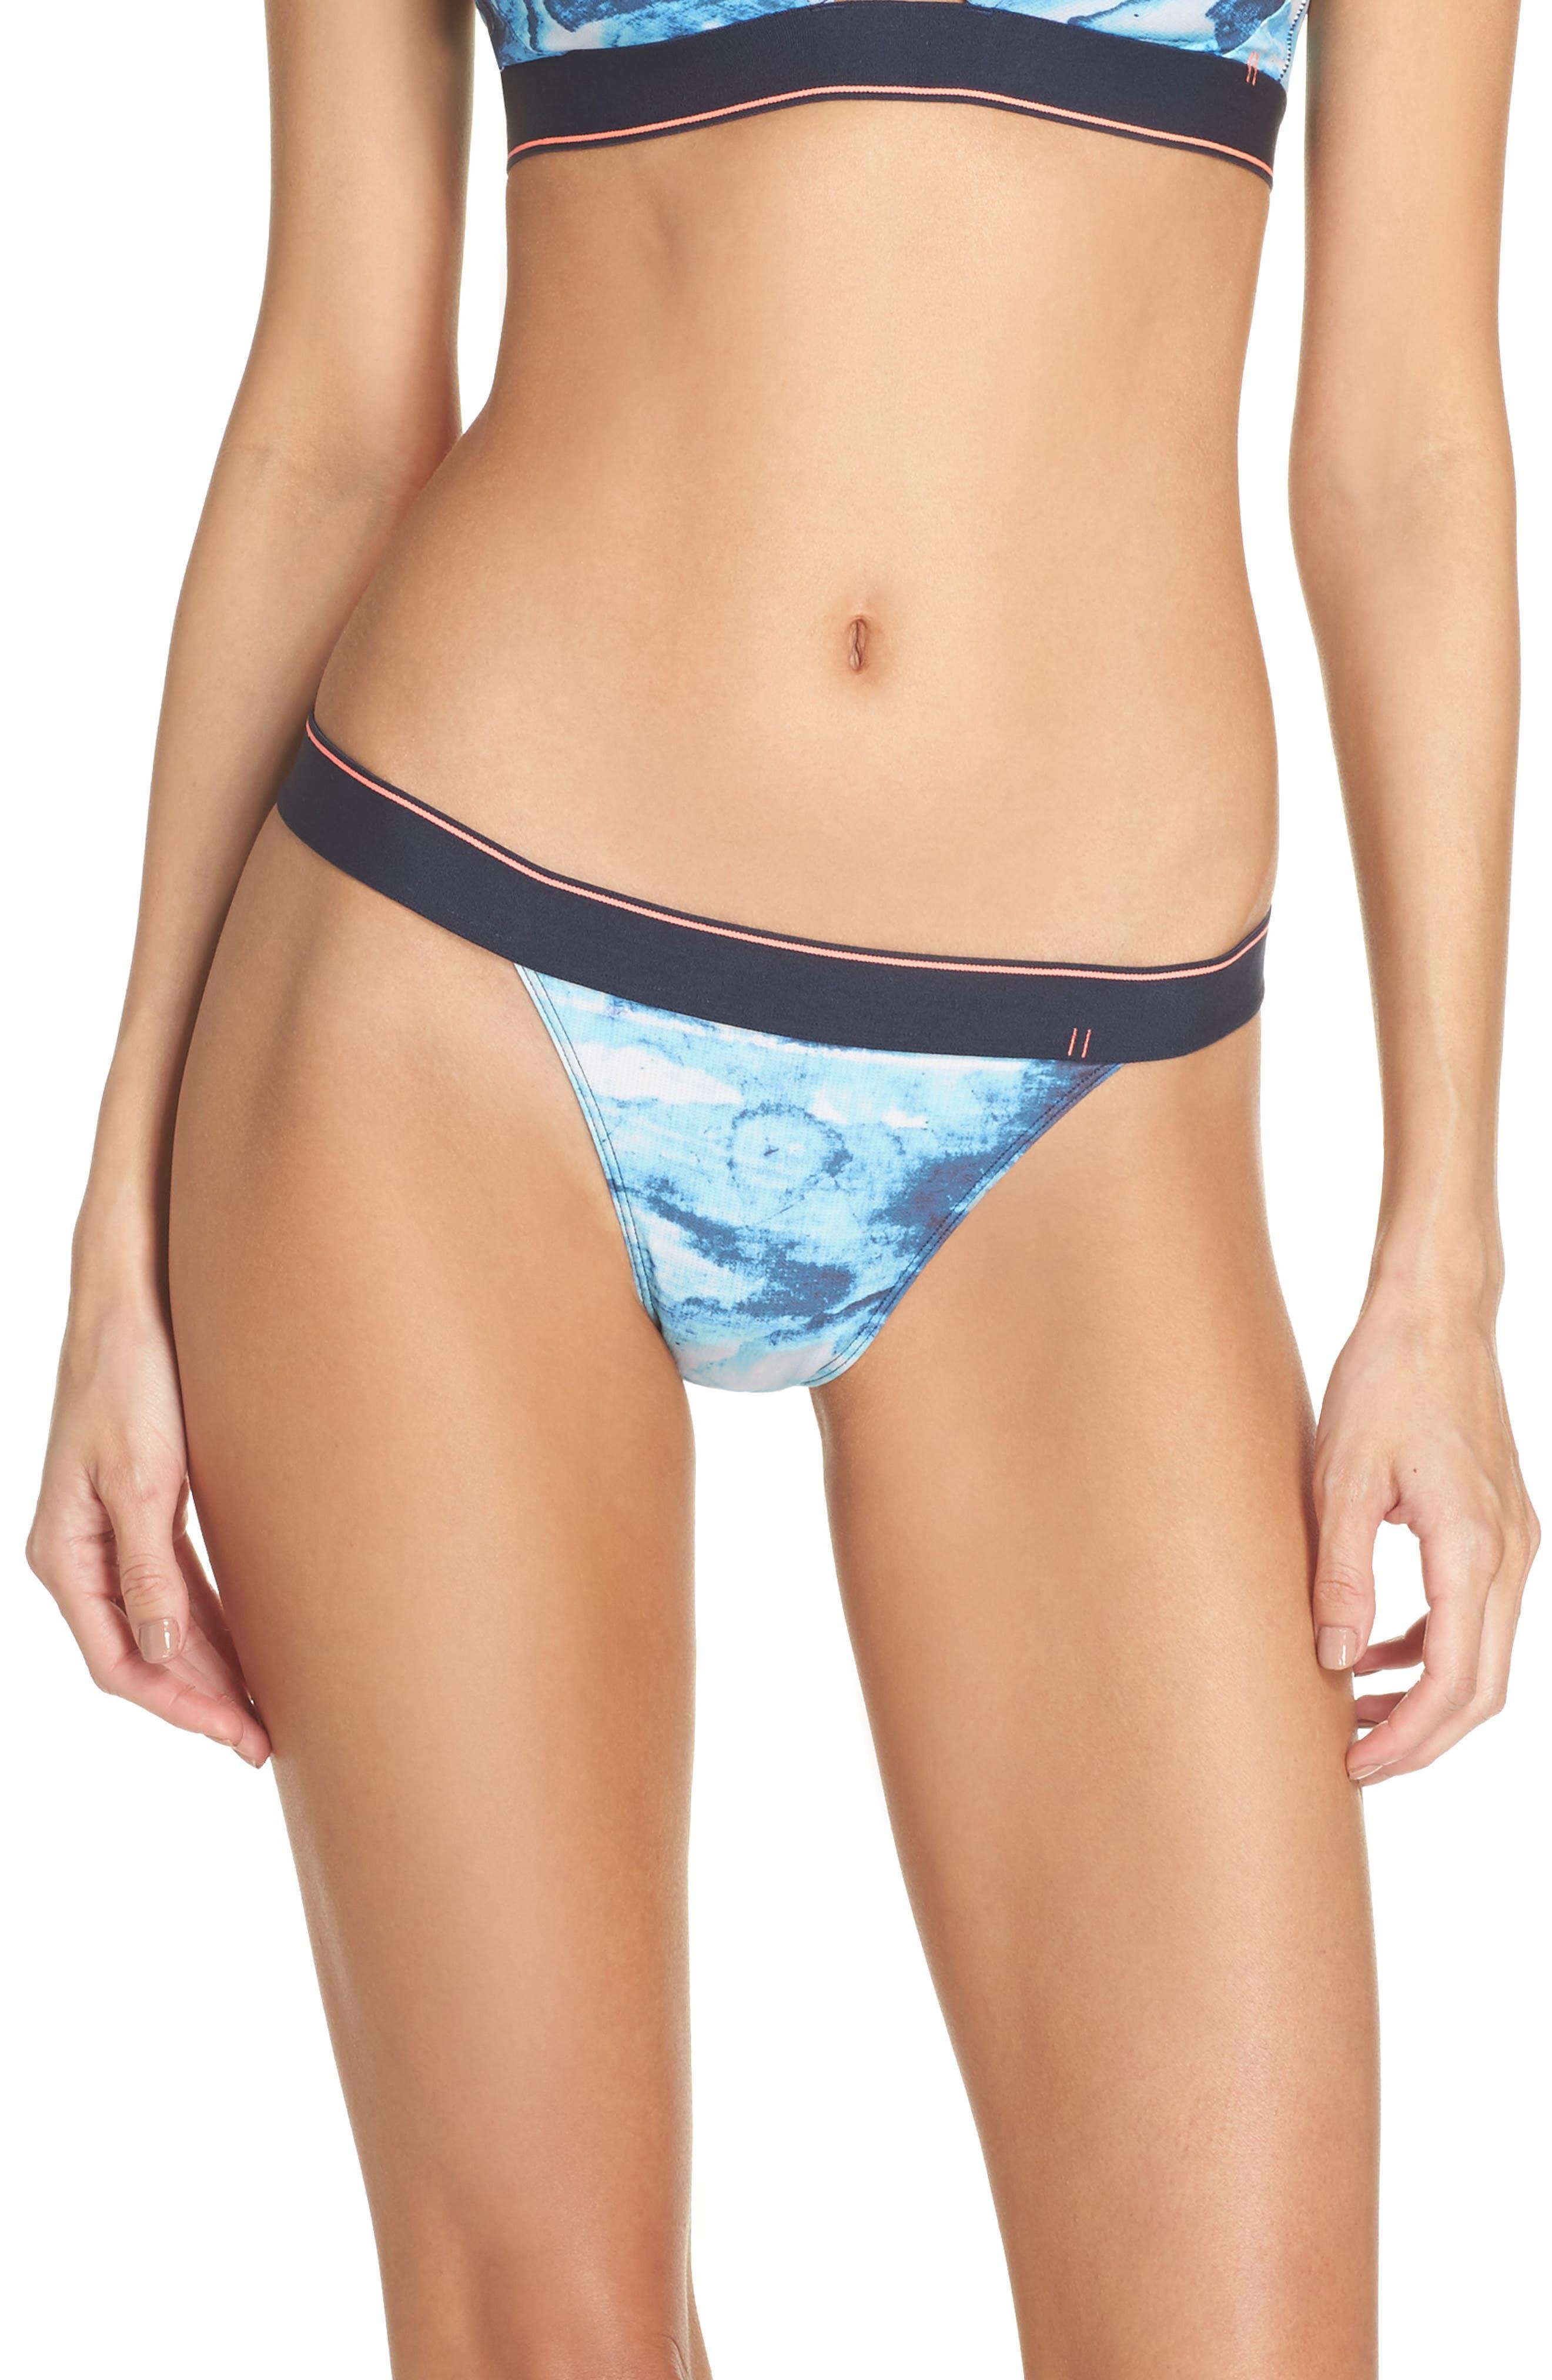 Tropic Storm Bikini,                             Main thumbnail 1, color,                             NAVY